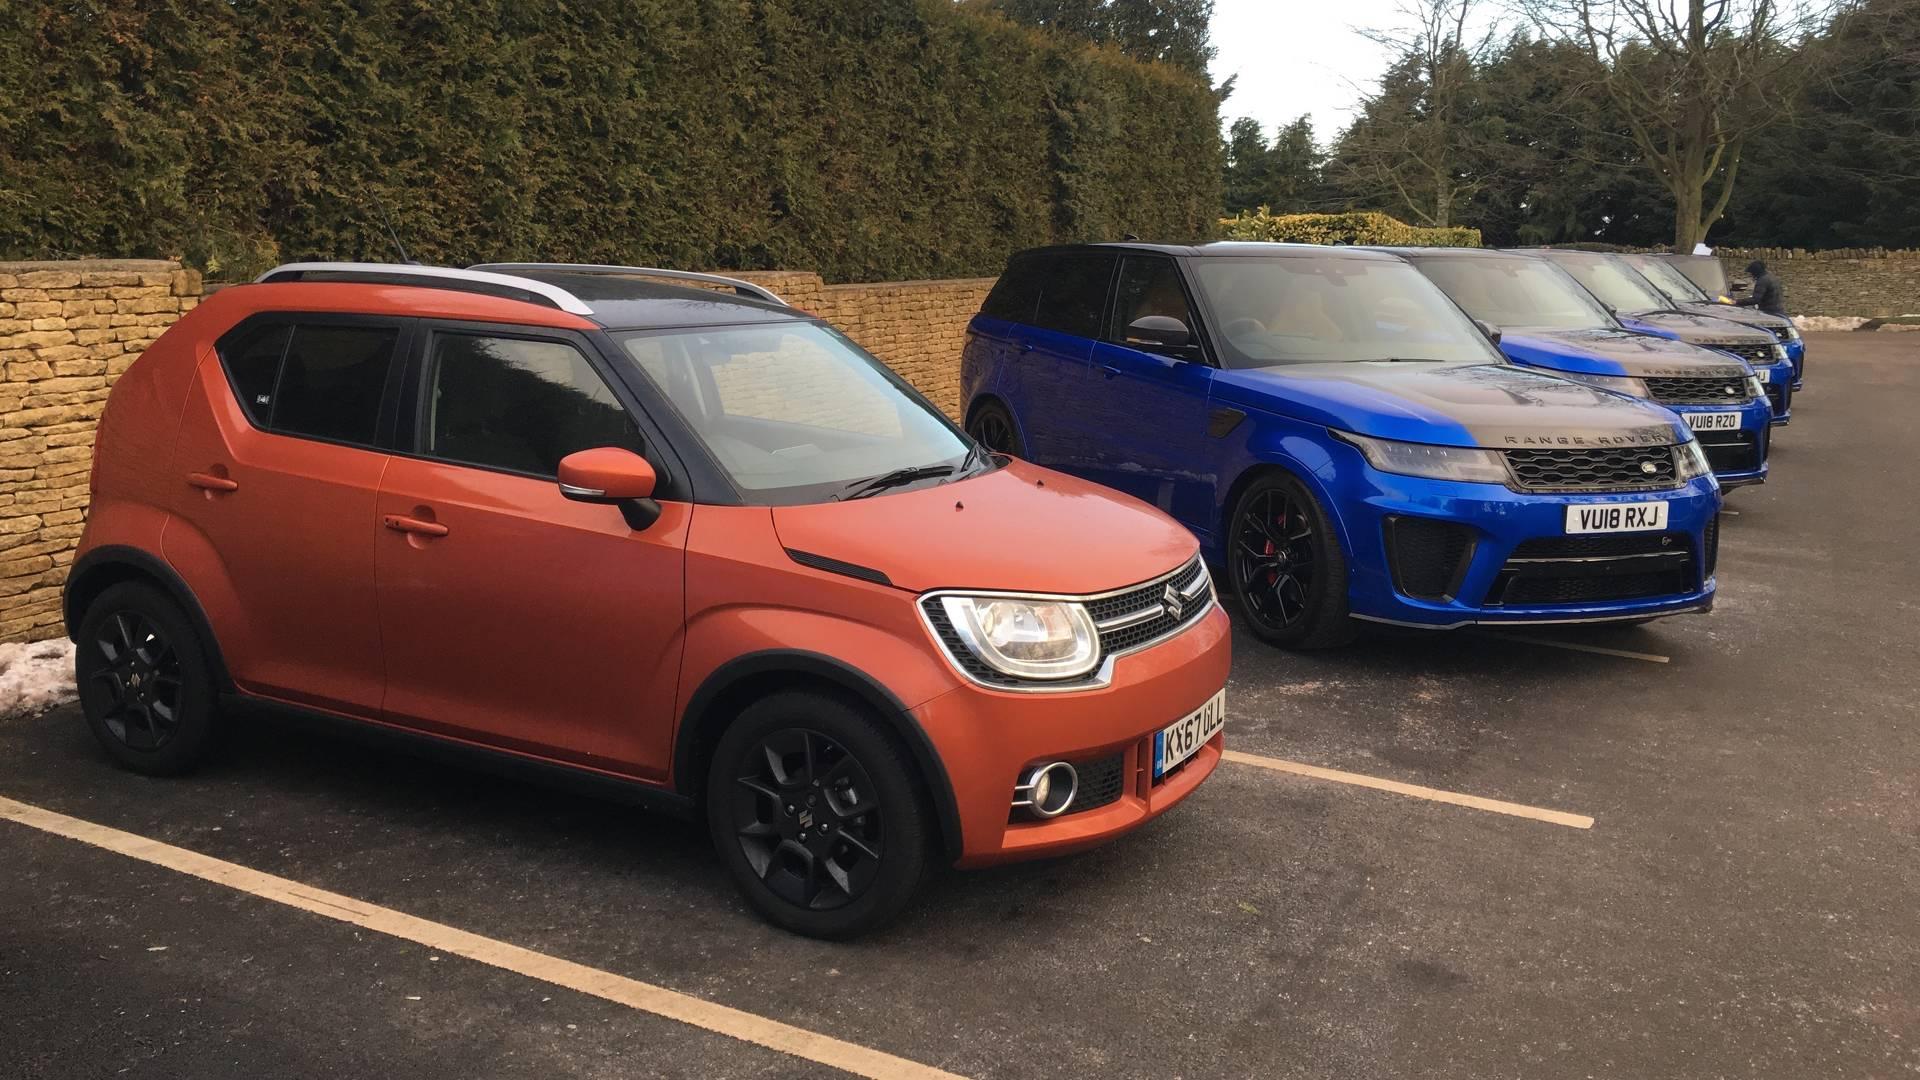 Suzuki Ignis 1 2 Sz5 Allgrip Living With It